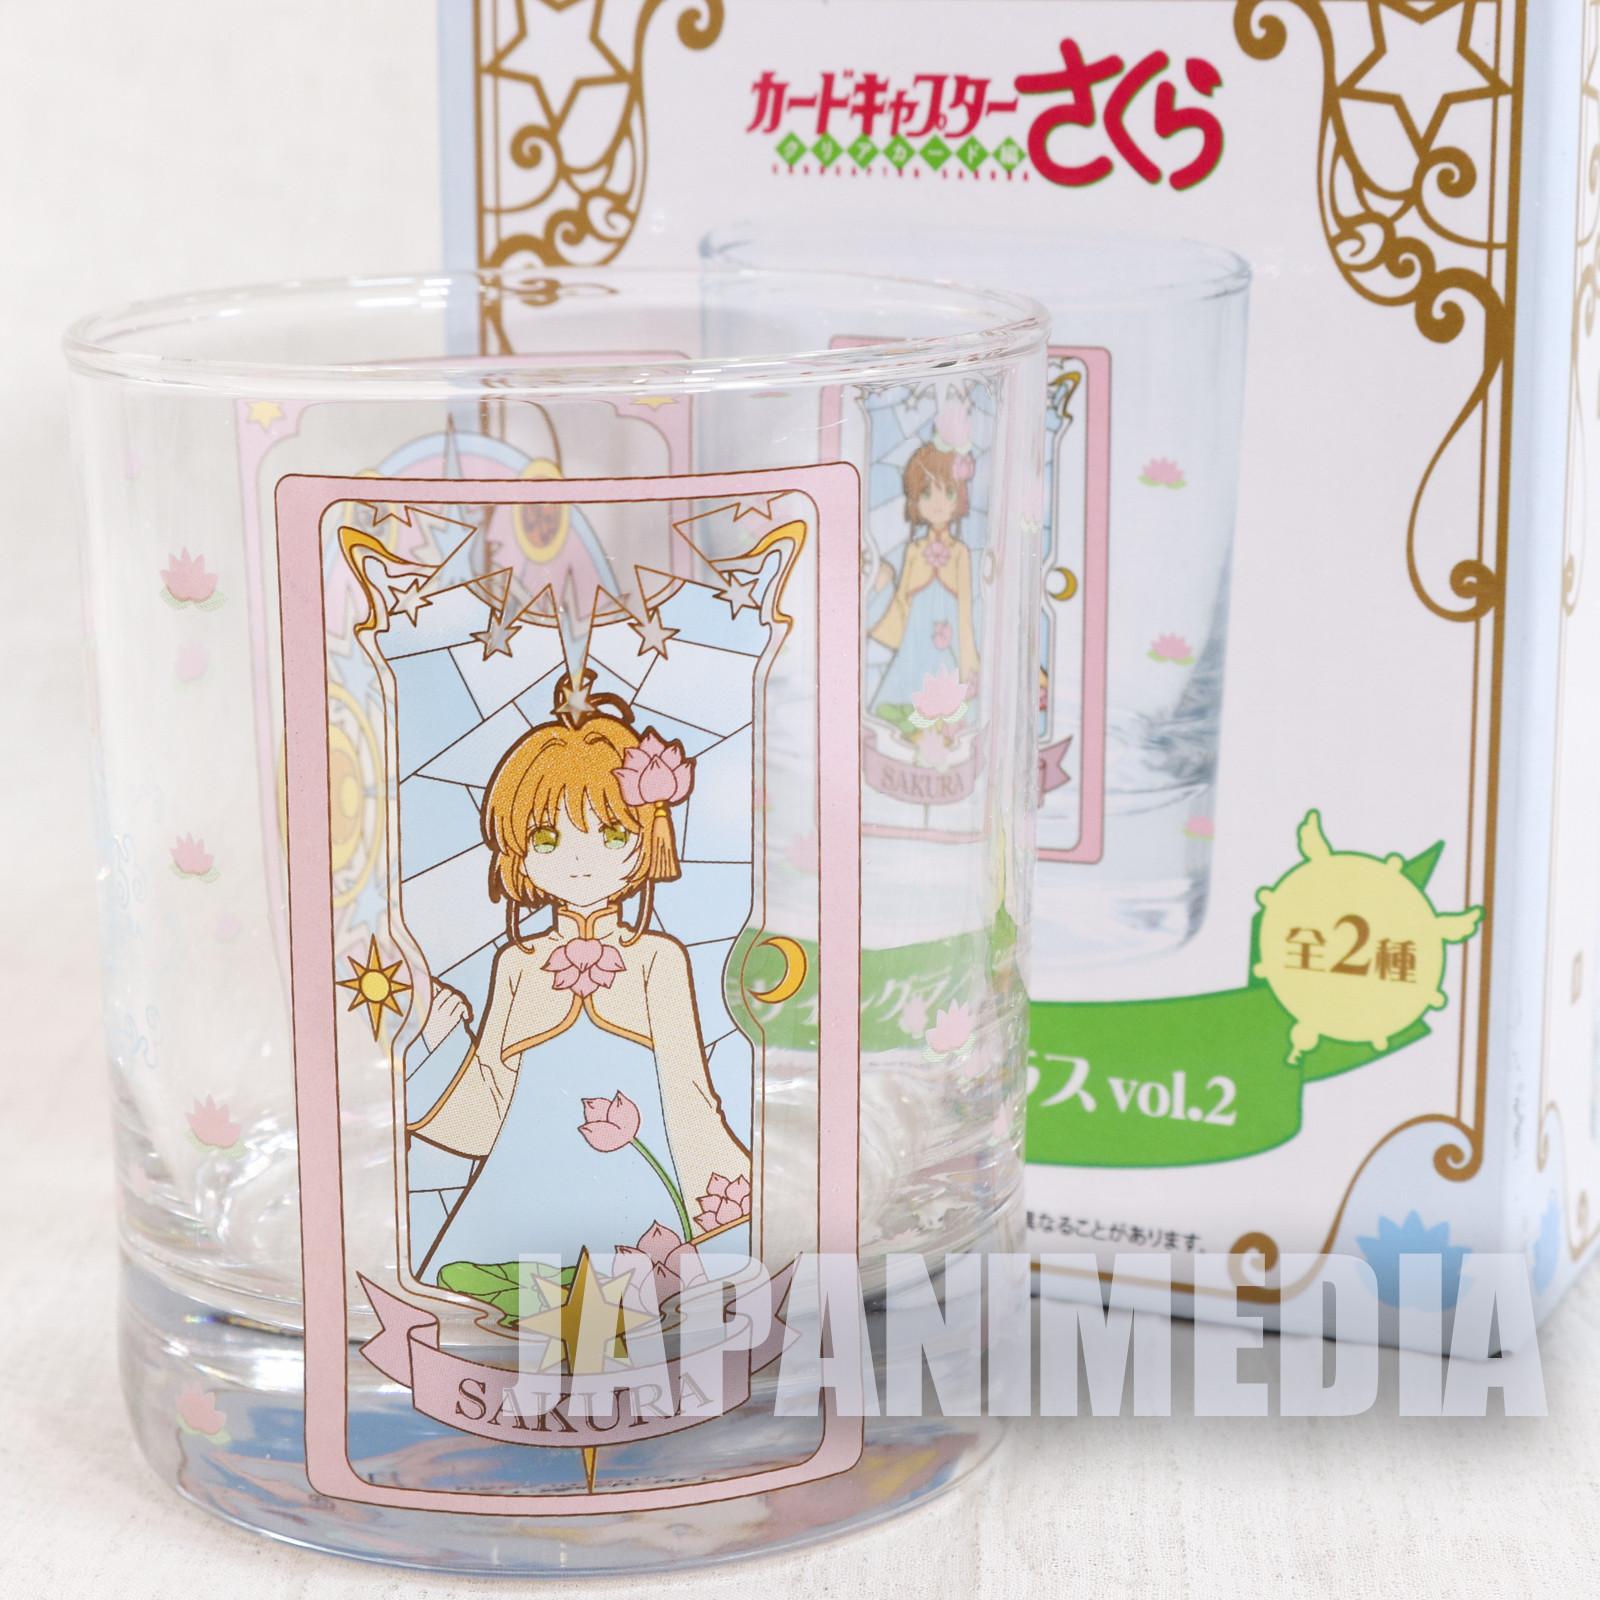 Cardcaptor Sakura Design Glass Vol.2 CLAMP JAPAN ANIME MANGA